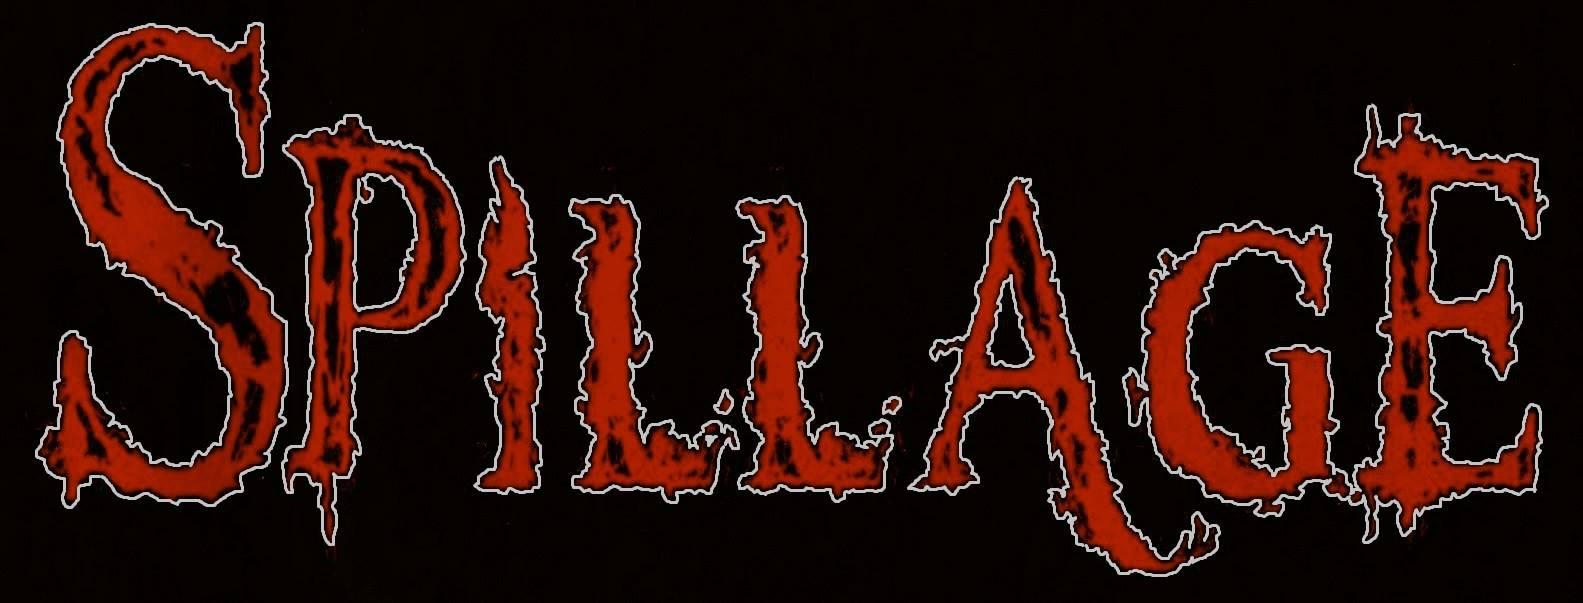 Spillage - Logo